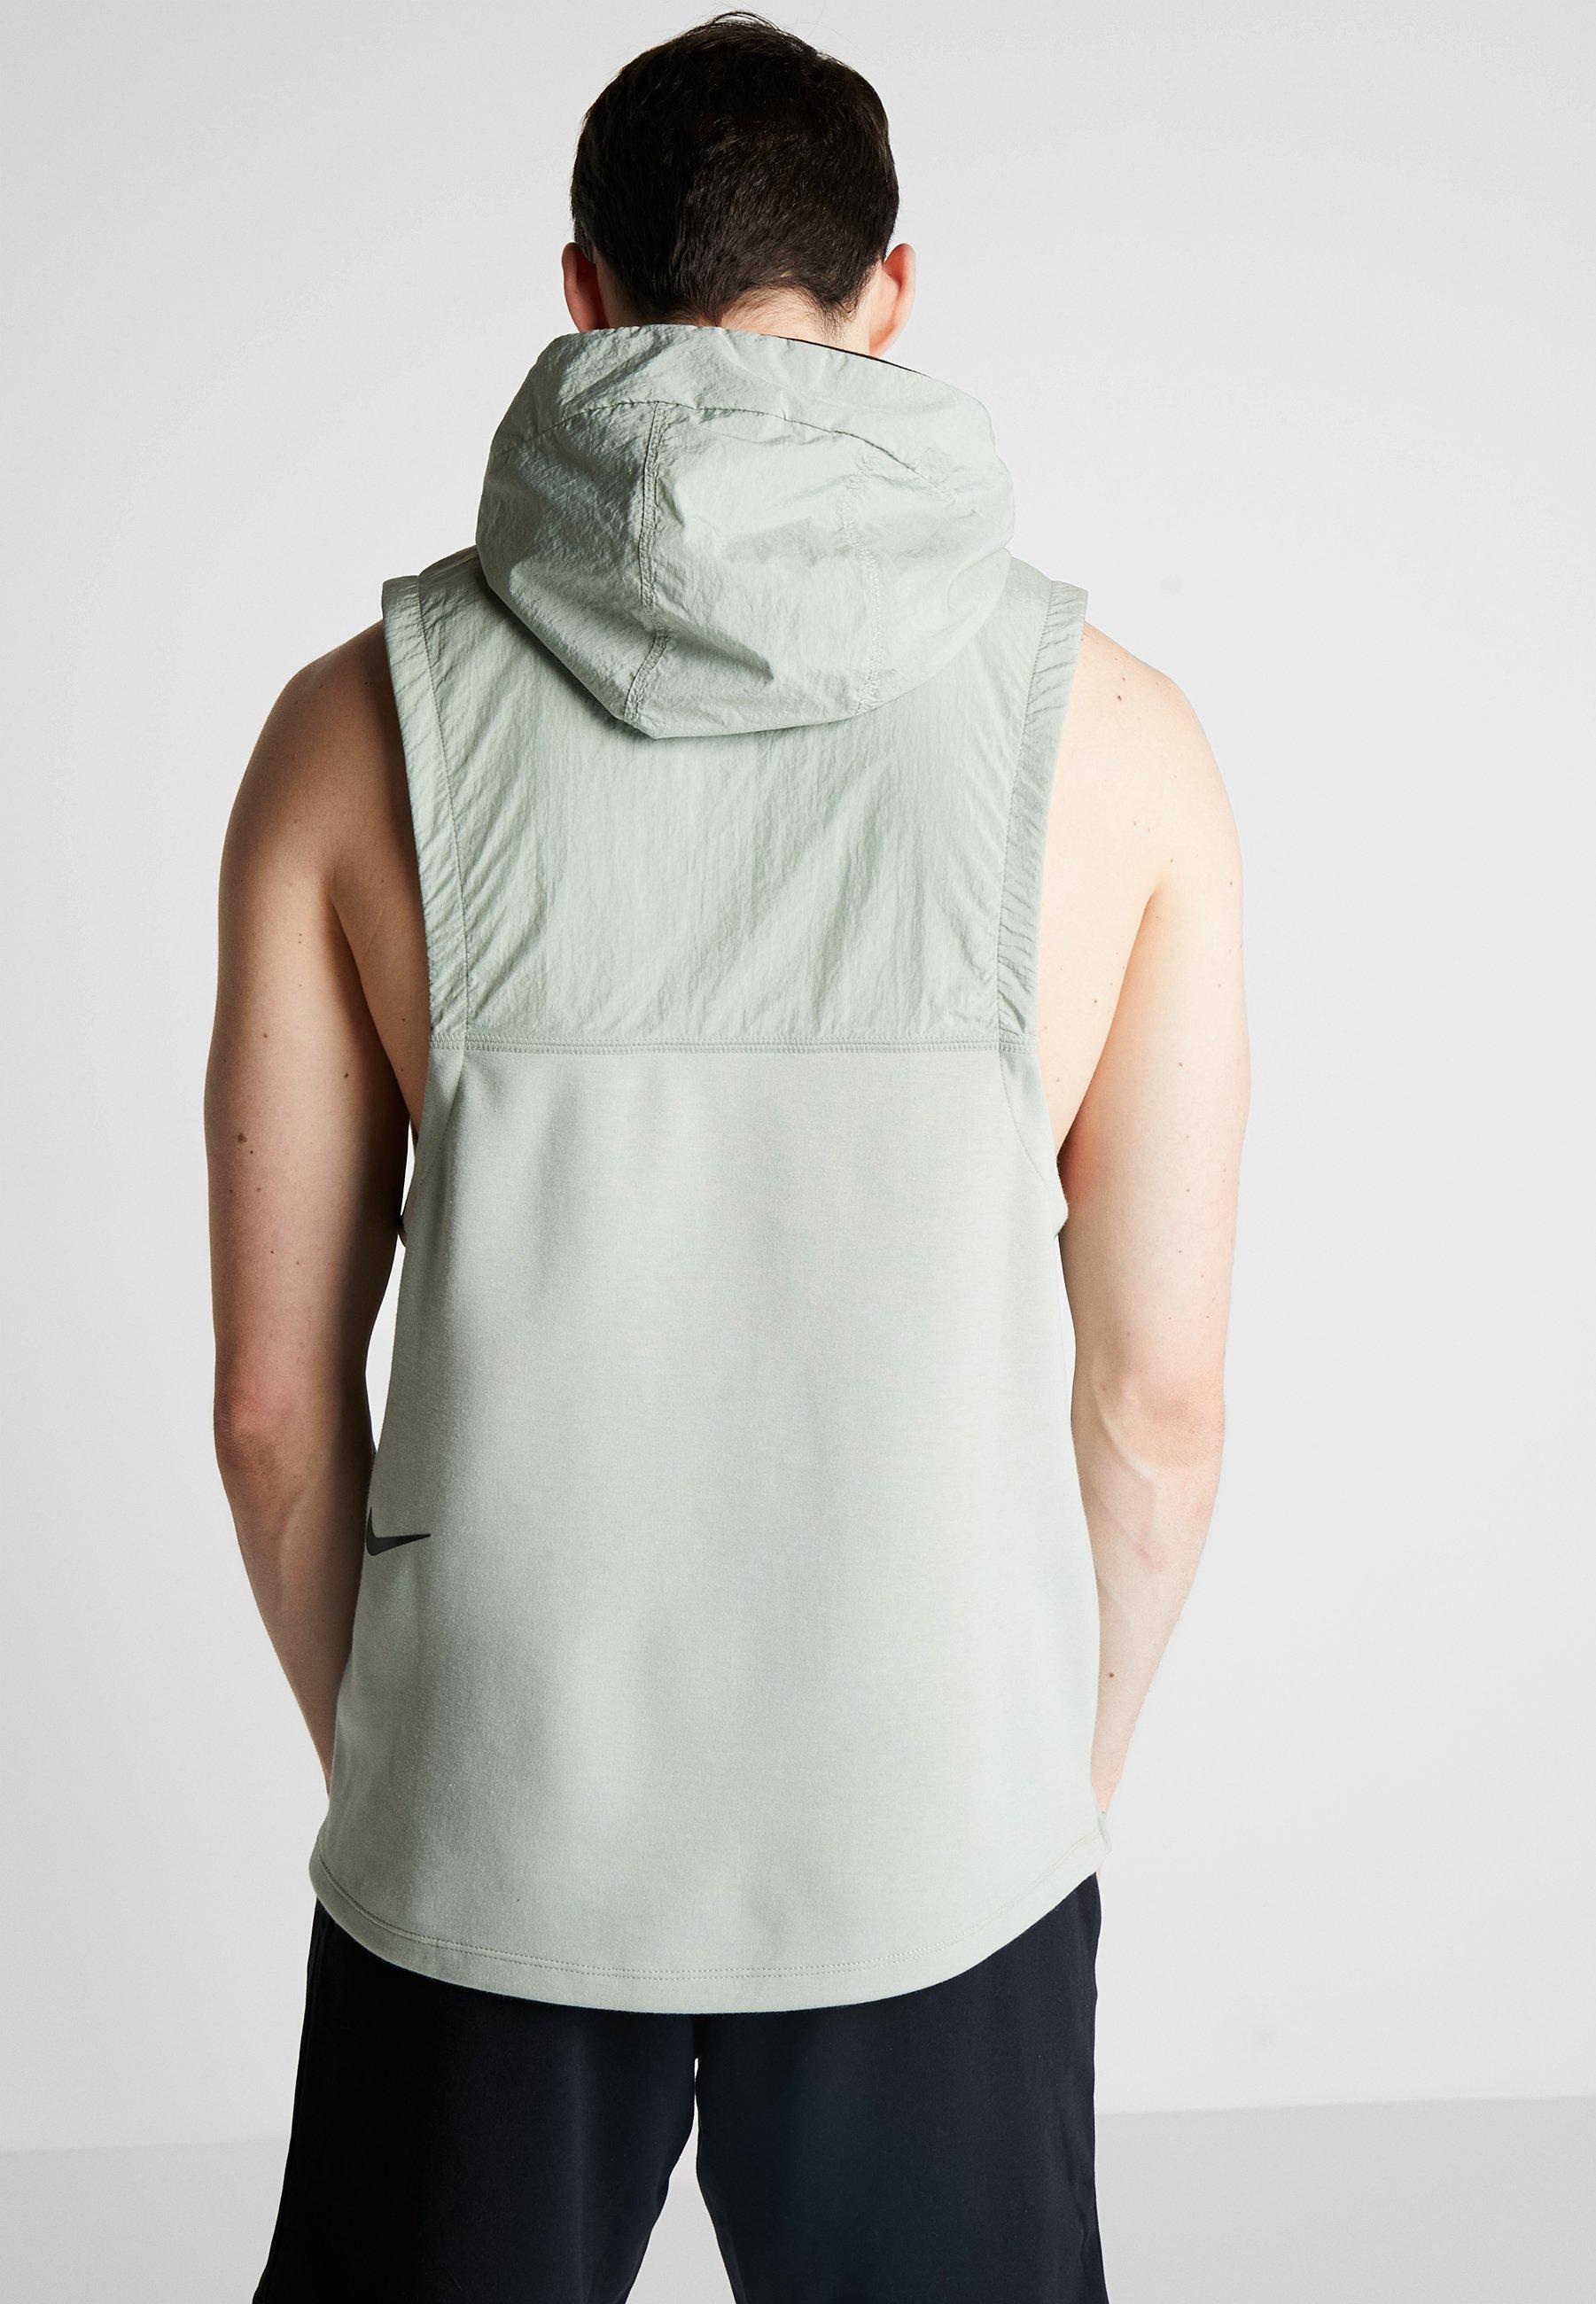 ThermaT black Nike shirt Horizon Sport De Jade Performance QreWodxCB